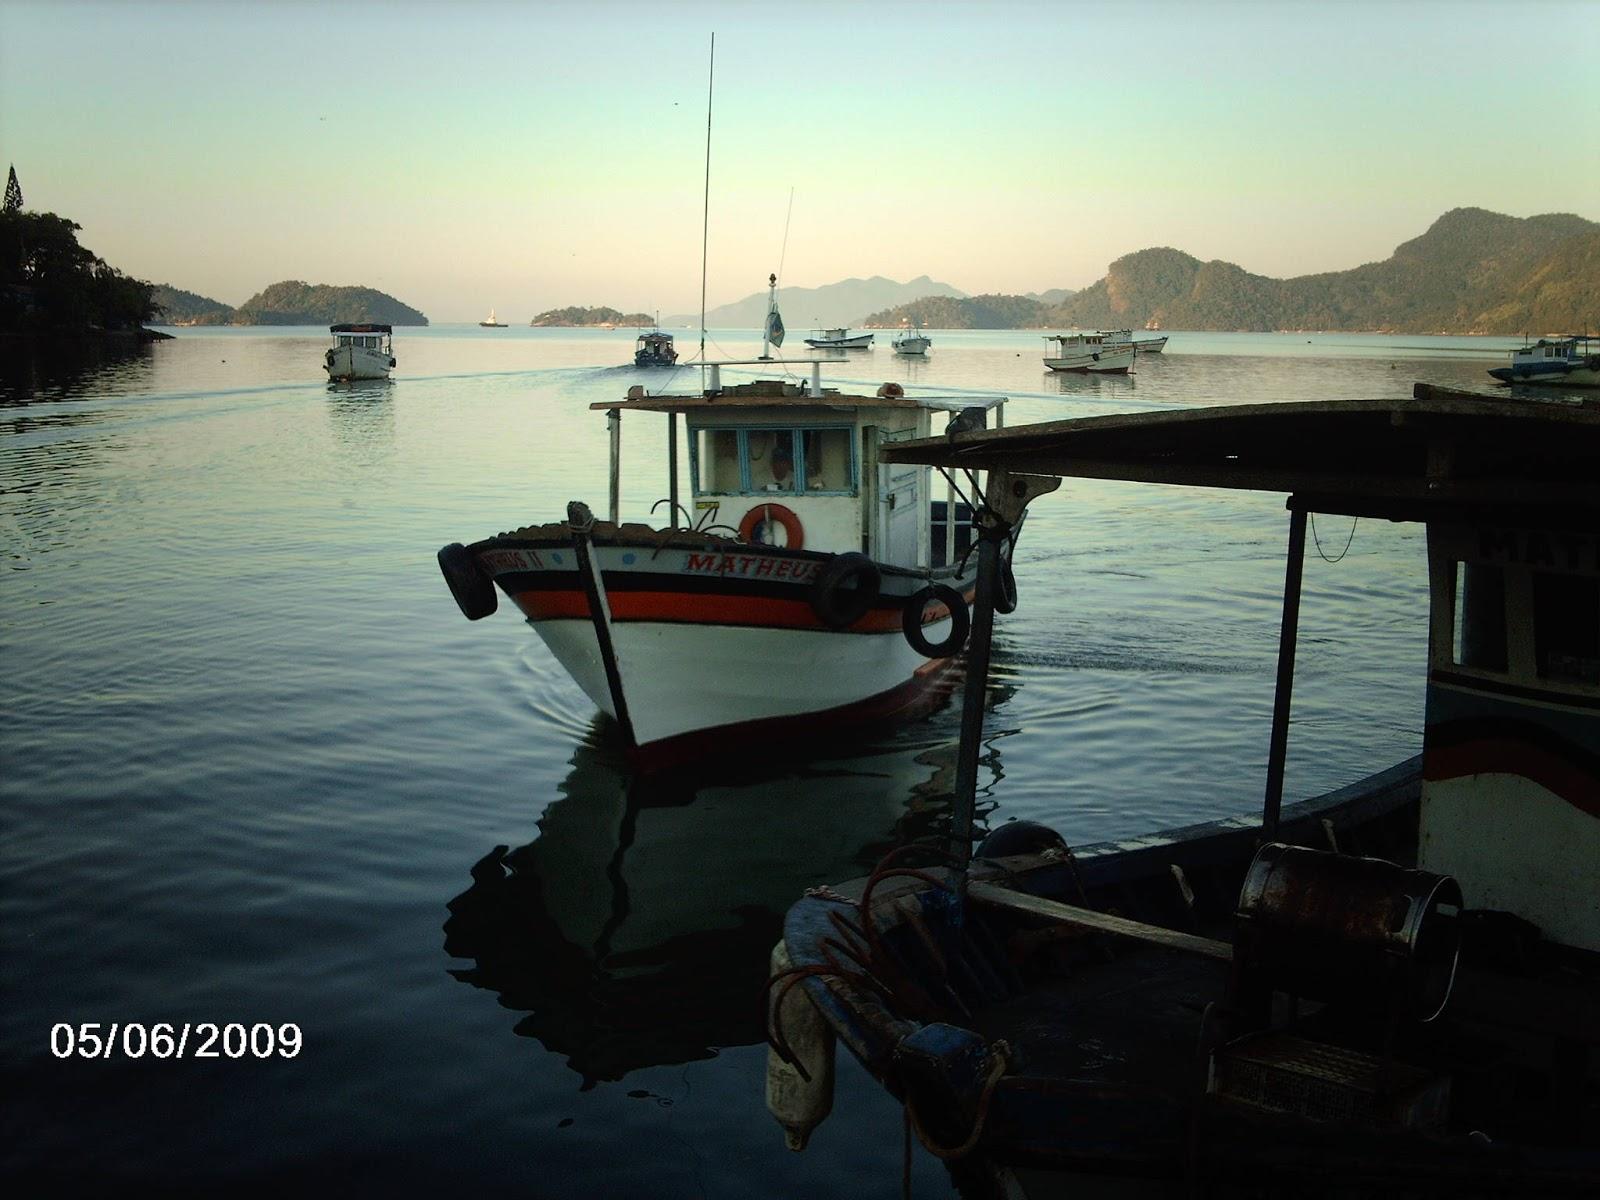 para a pescaria que será feita nas águas da Baia de Sepetiba #5D7E4D 1600x1200